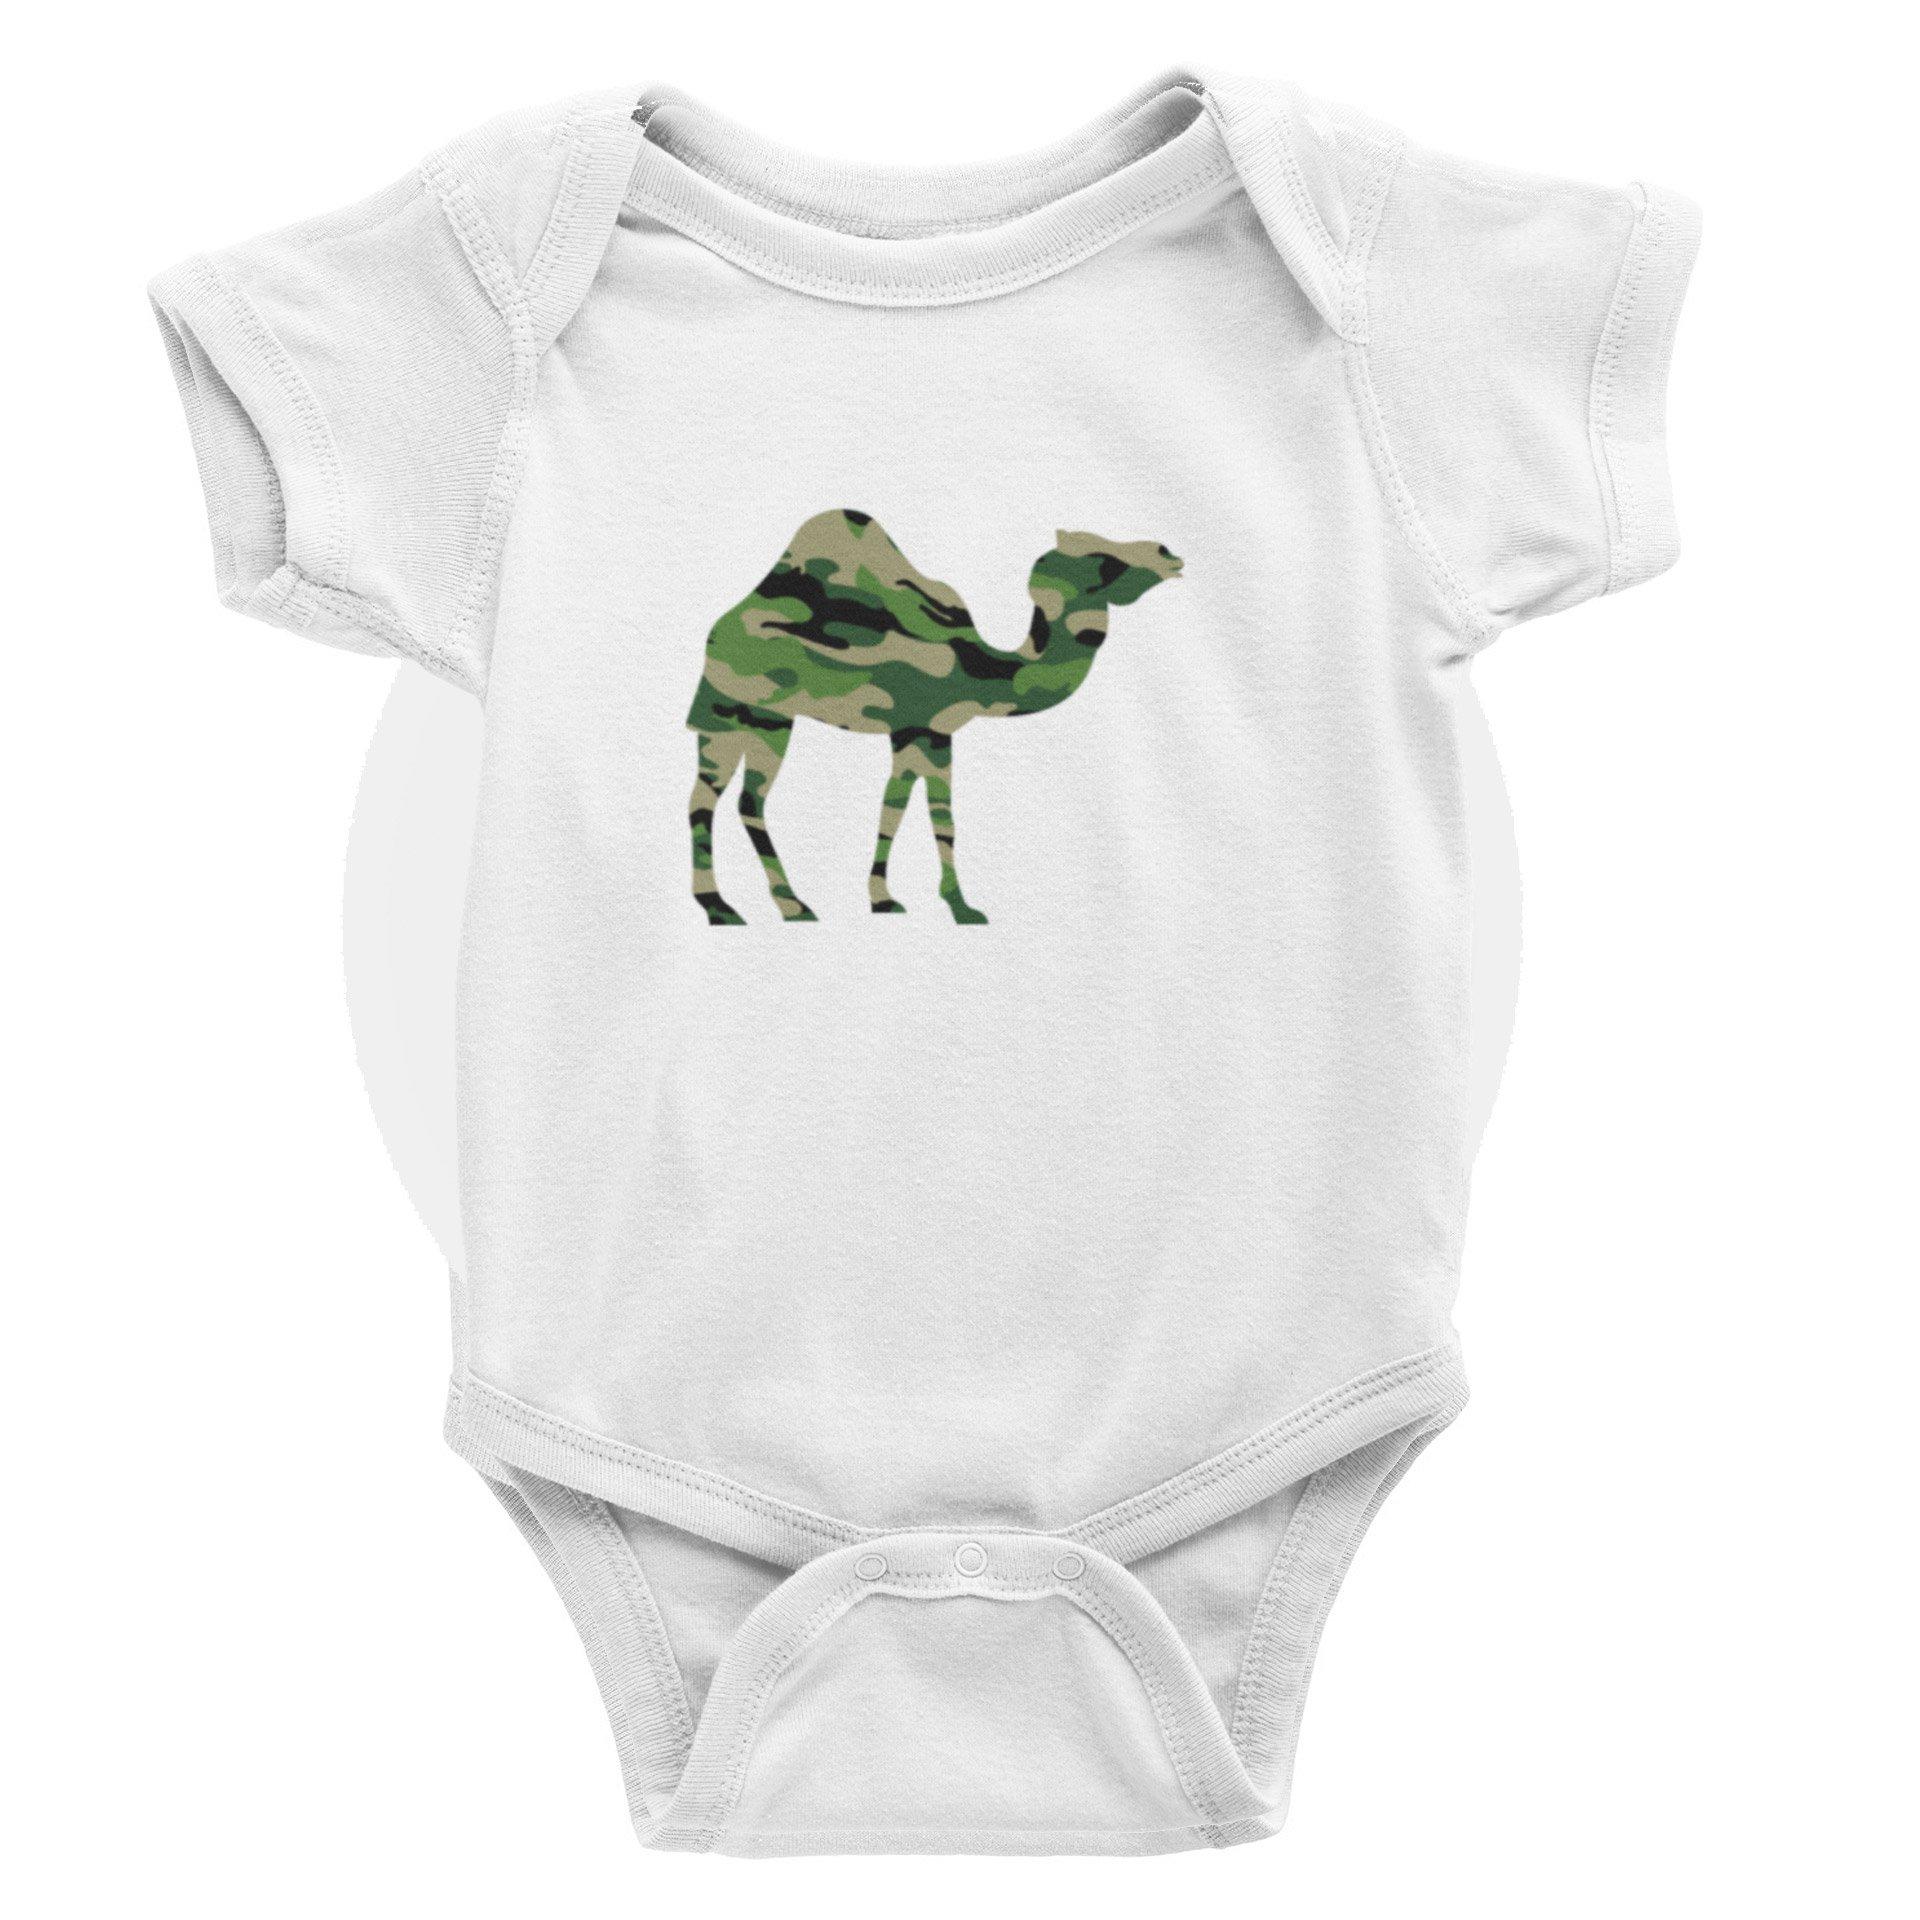 Camo Camel S-Sleeve Romper